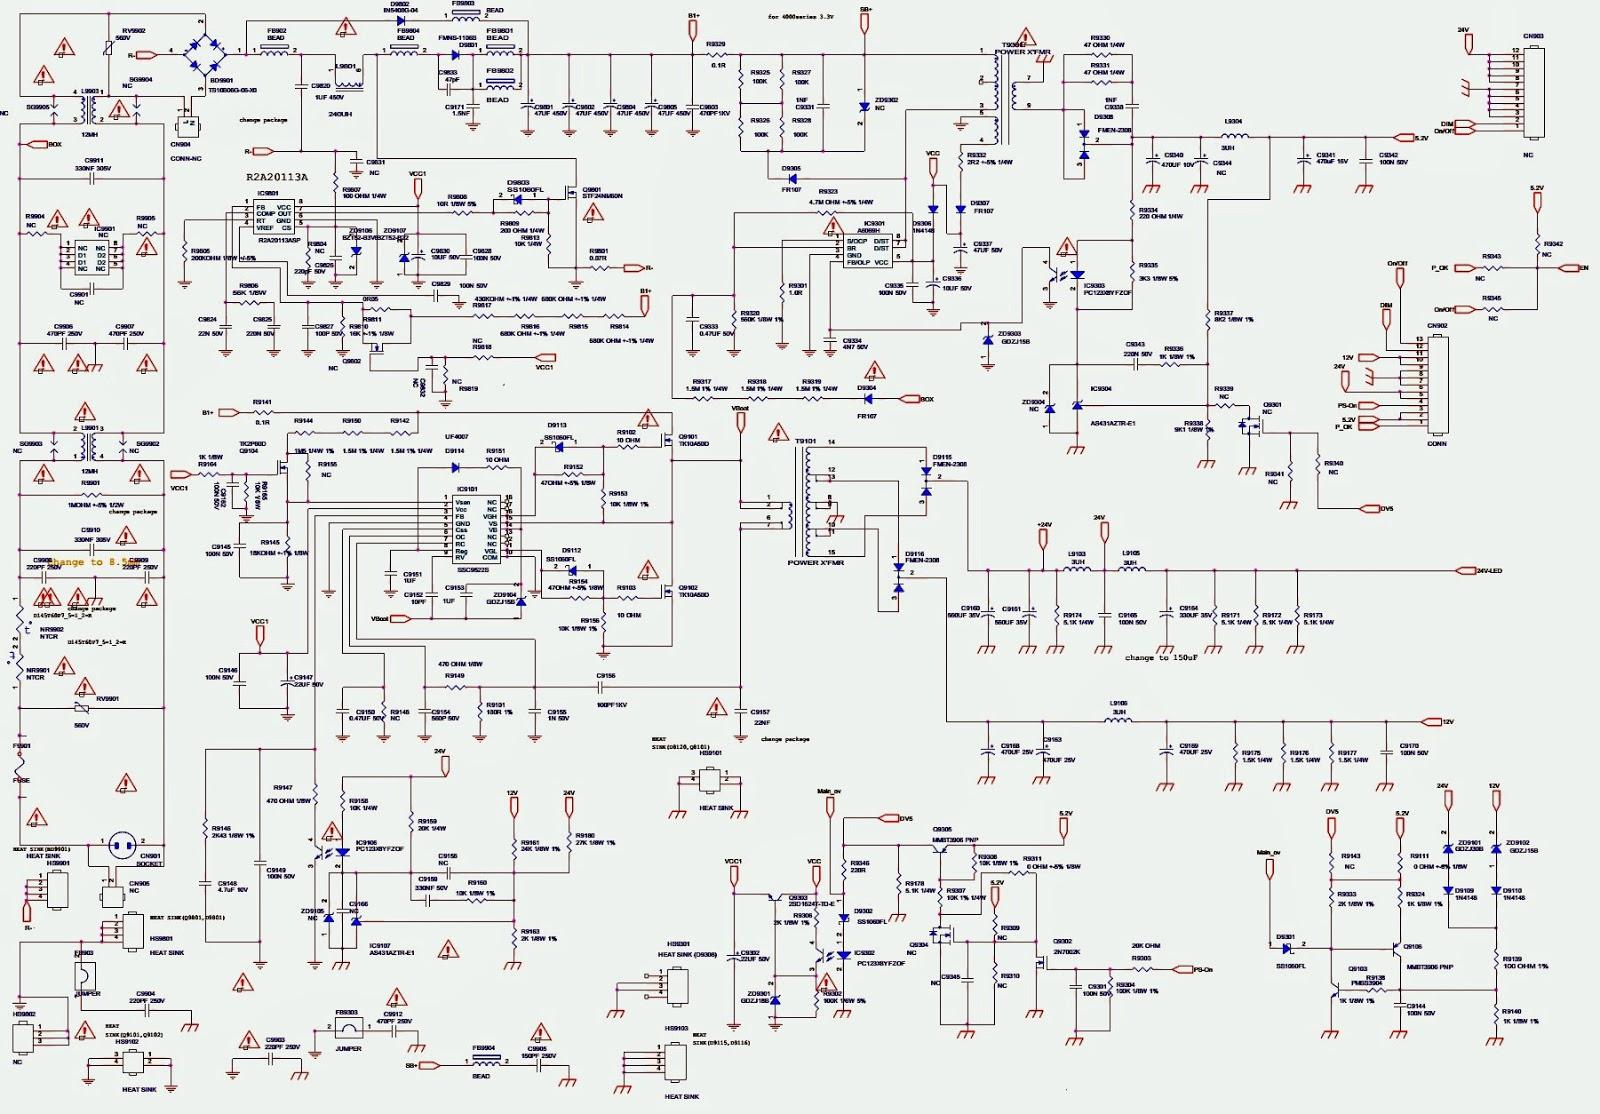 sanyo fvm4612 - dp46132 - dp46132m - dis-assembly - power ... pc power supply wiring diagram sanyo power supply wiring diagram #13